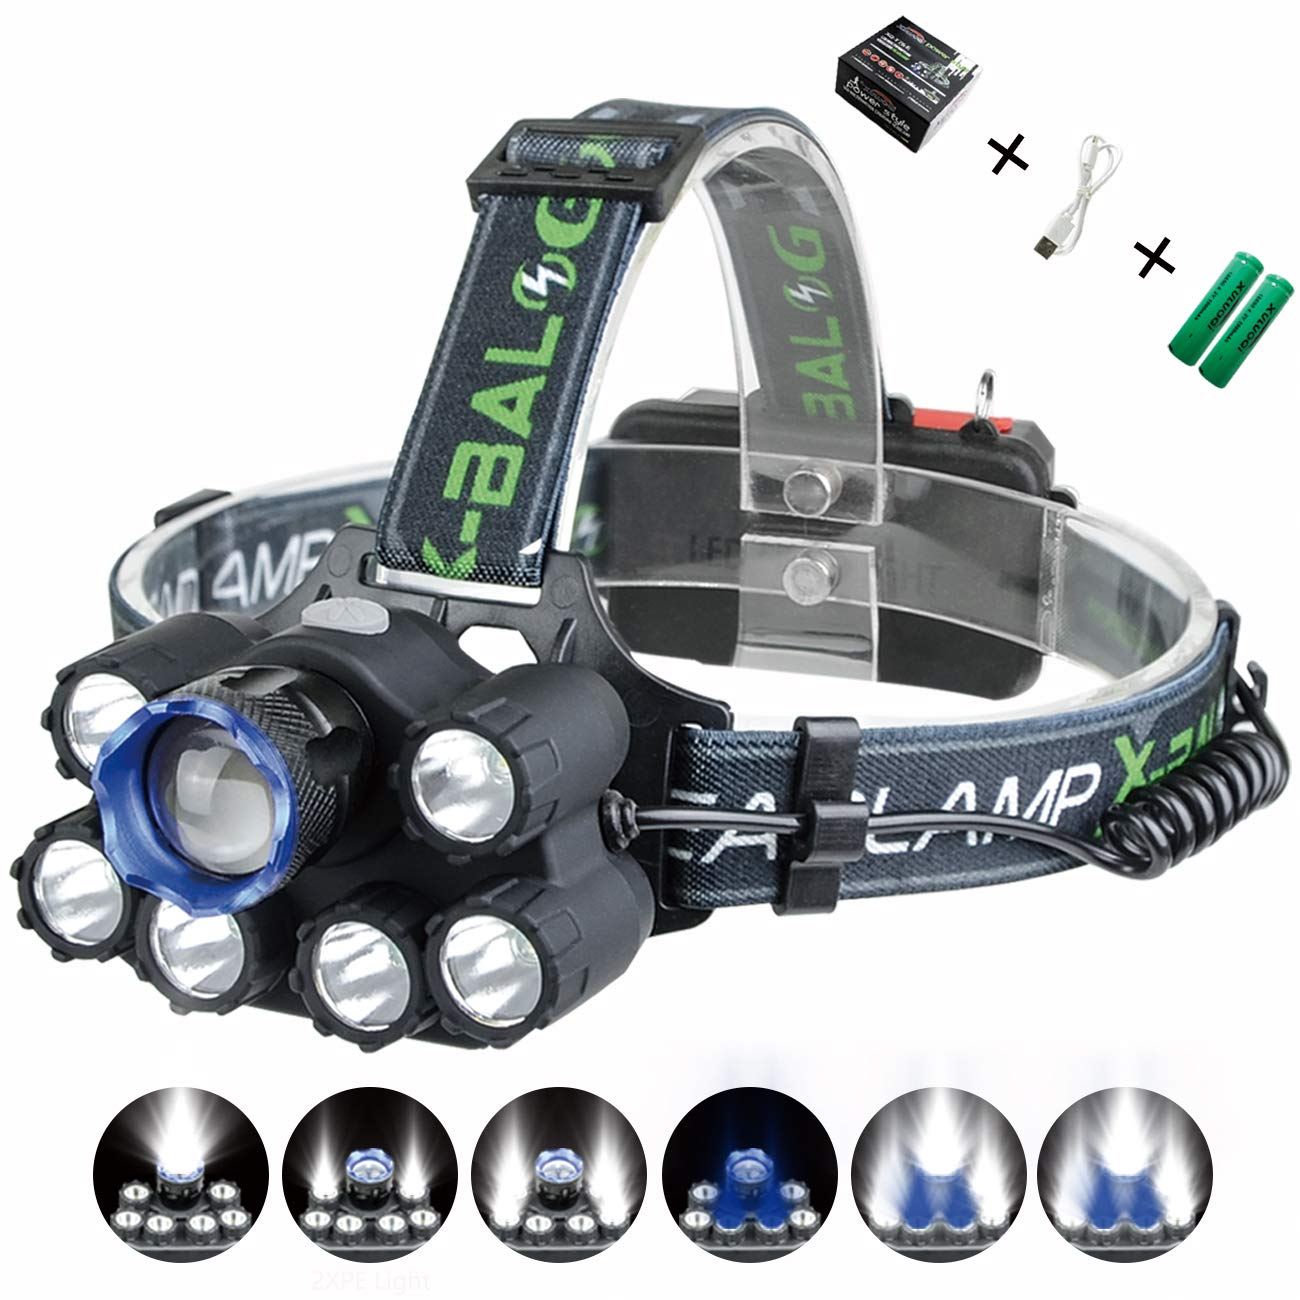 XULUOQI Headlamp, Brightest LED Headlamp,USB Rechargeable Headlamp Flashlight - 8000 Lumens Waterproof and Comfortable Headlamp 7-Light 6-Mode Super Bright Outdoor Camping Fishing Headlamp